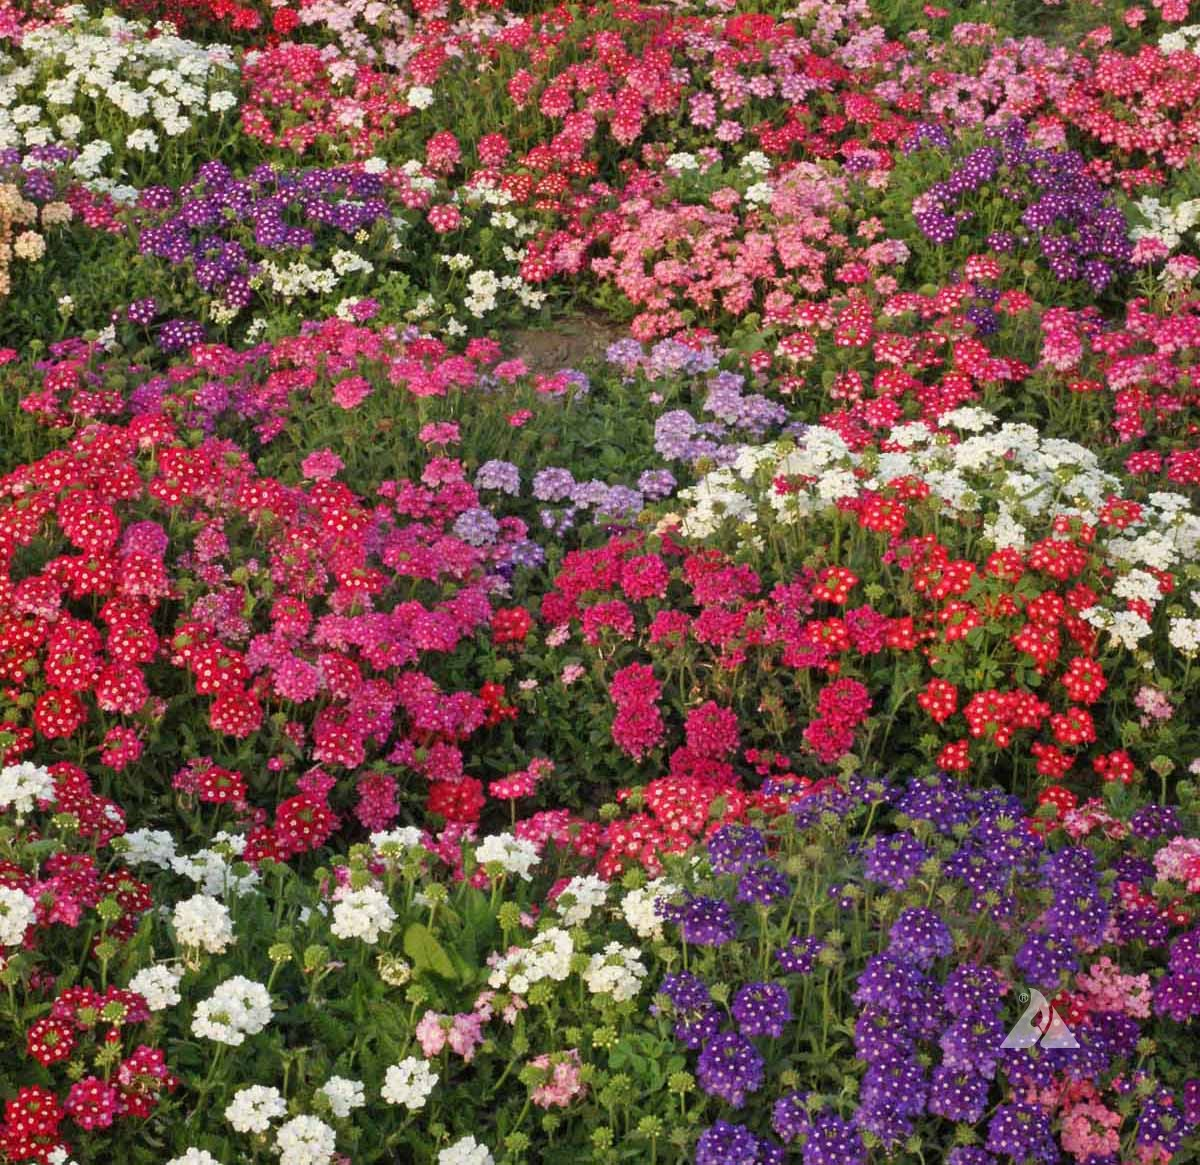 K Verbena Hybrida Scentsation Mix Approx 25 seeds Bedding Plant,